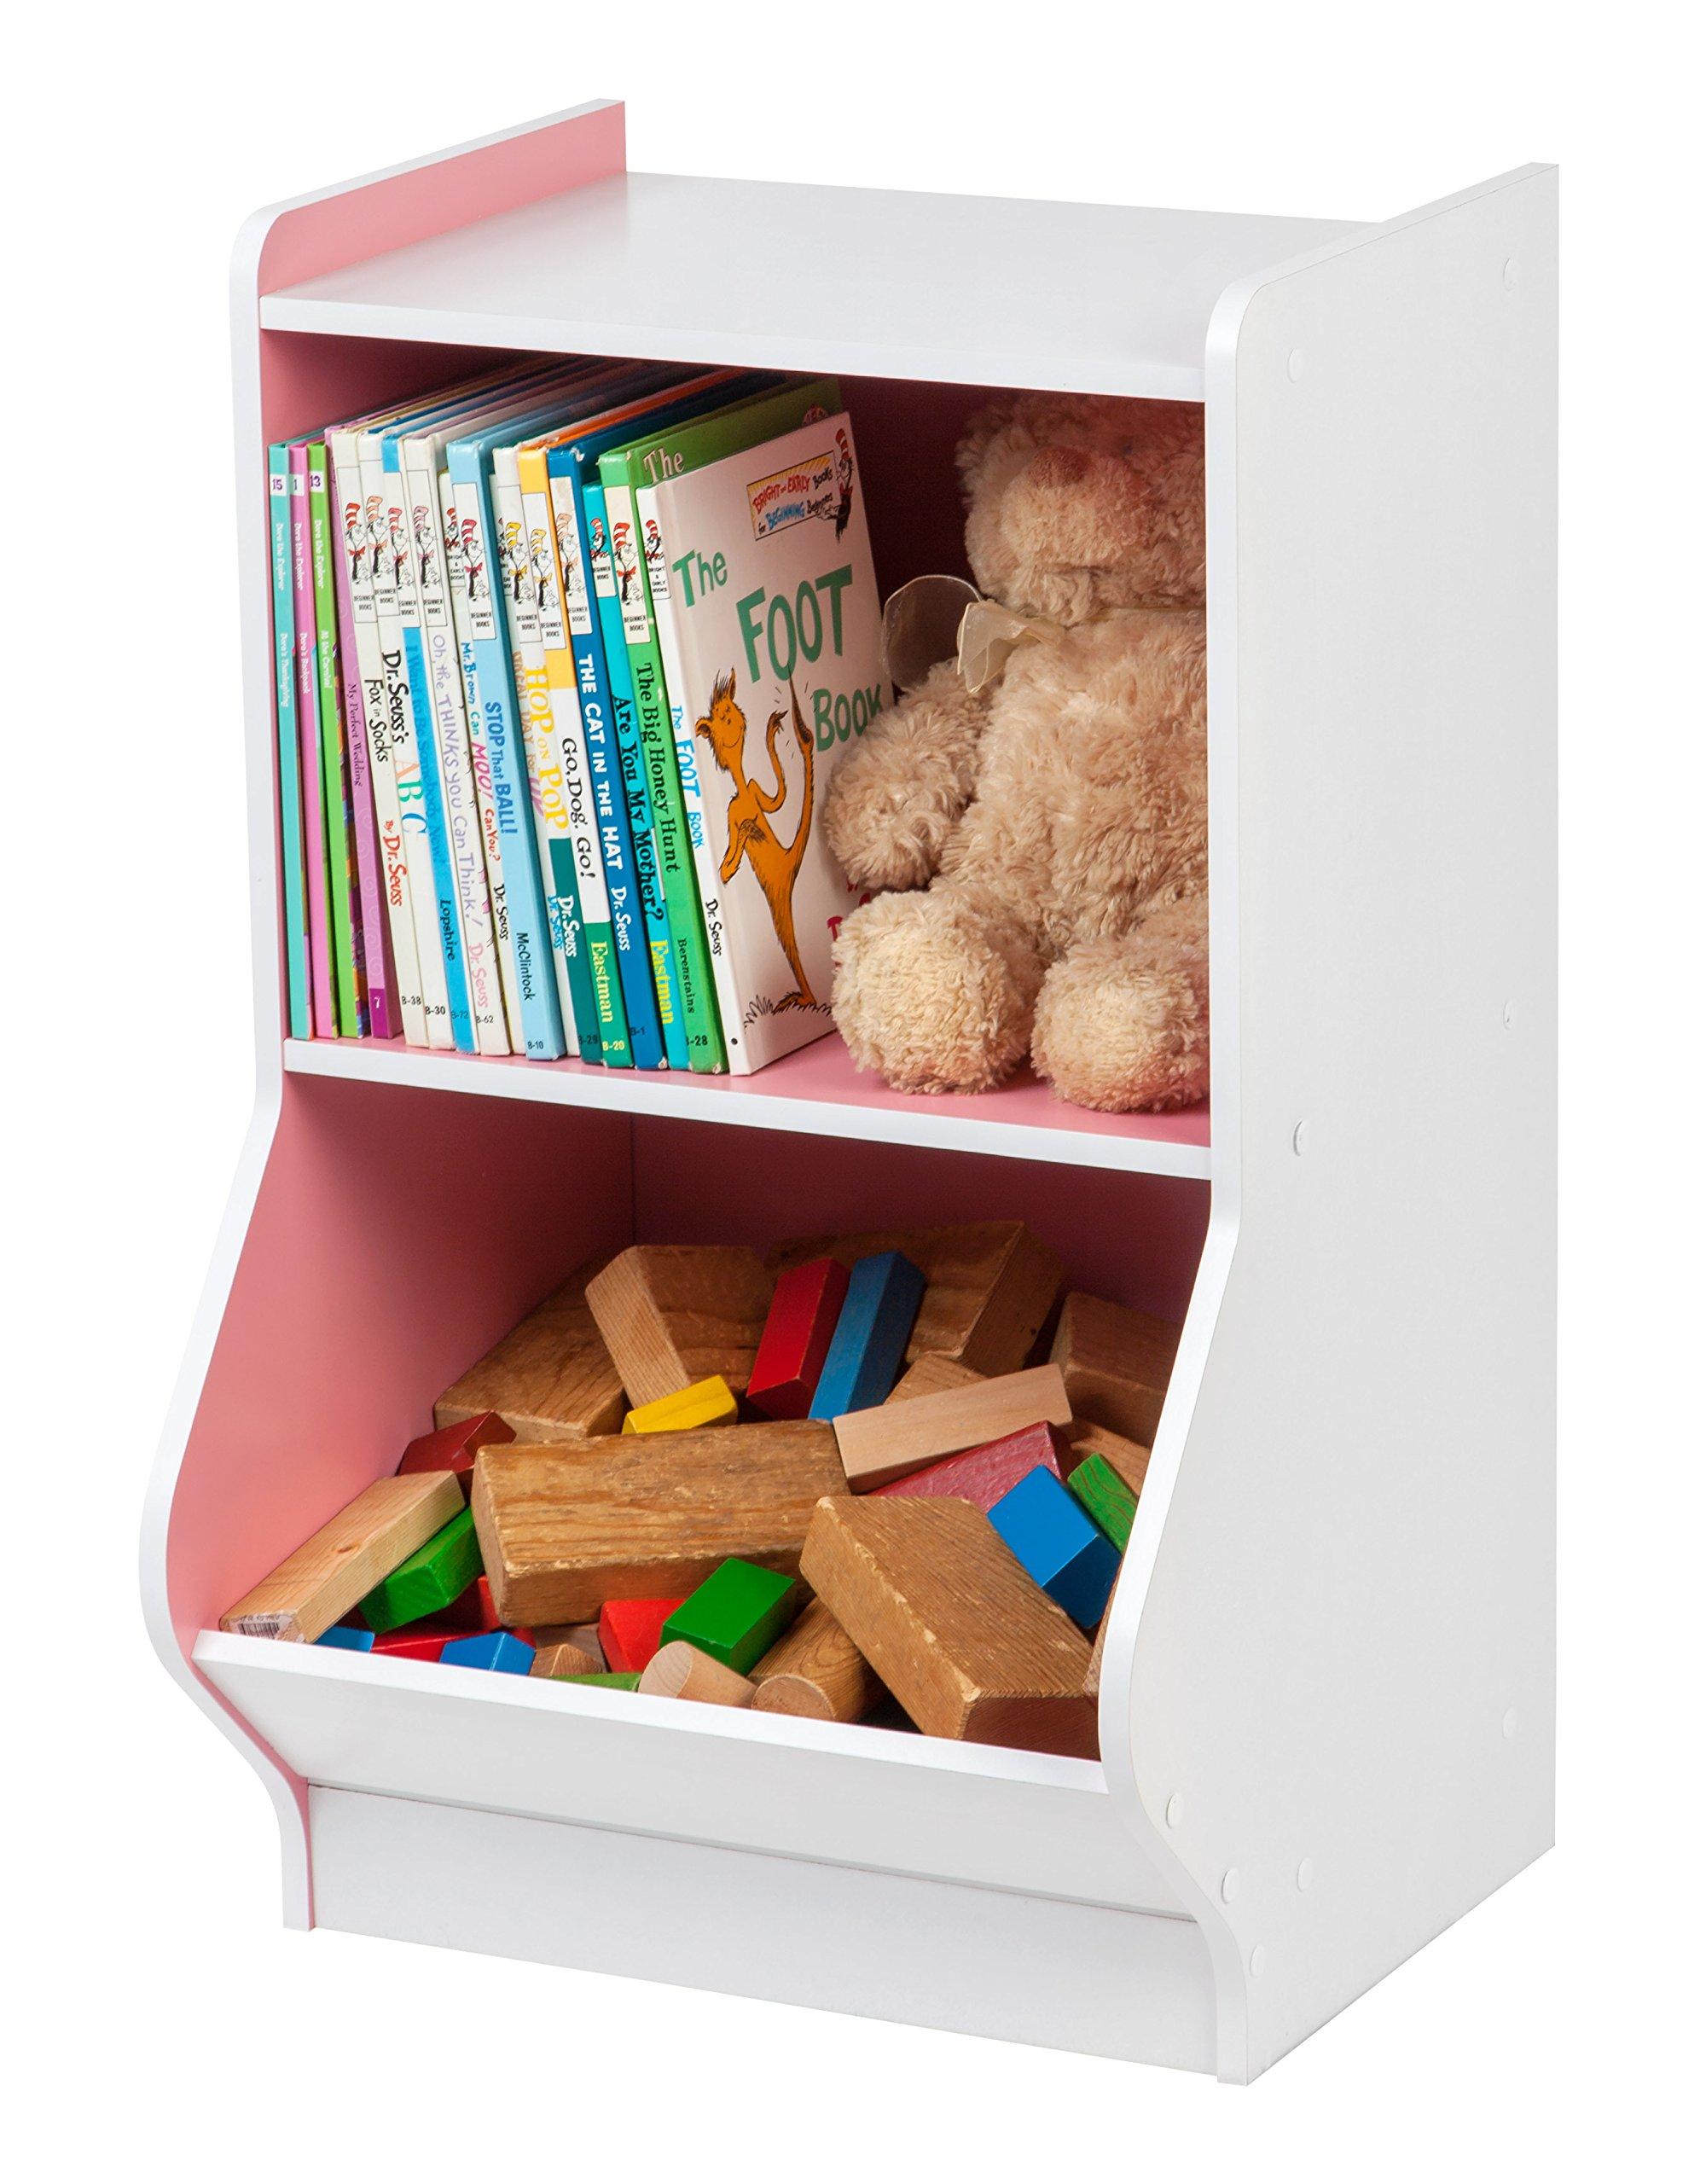 IRIS 2-Tier Storage Organizer Shelf with Footboard, White and Pink by IRIS USA, Inc. (Image #3)